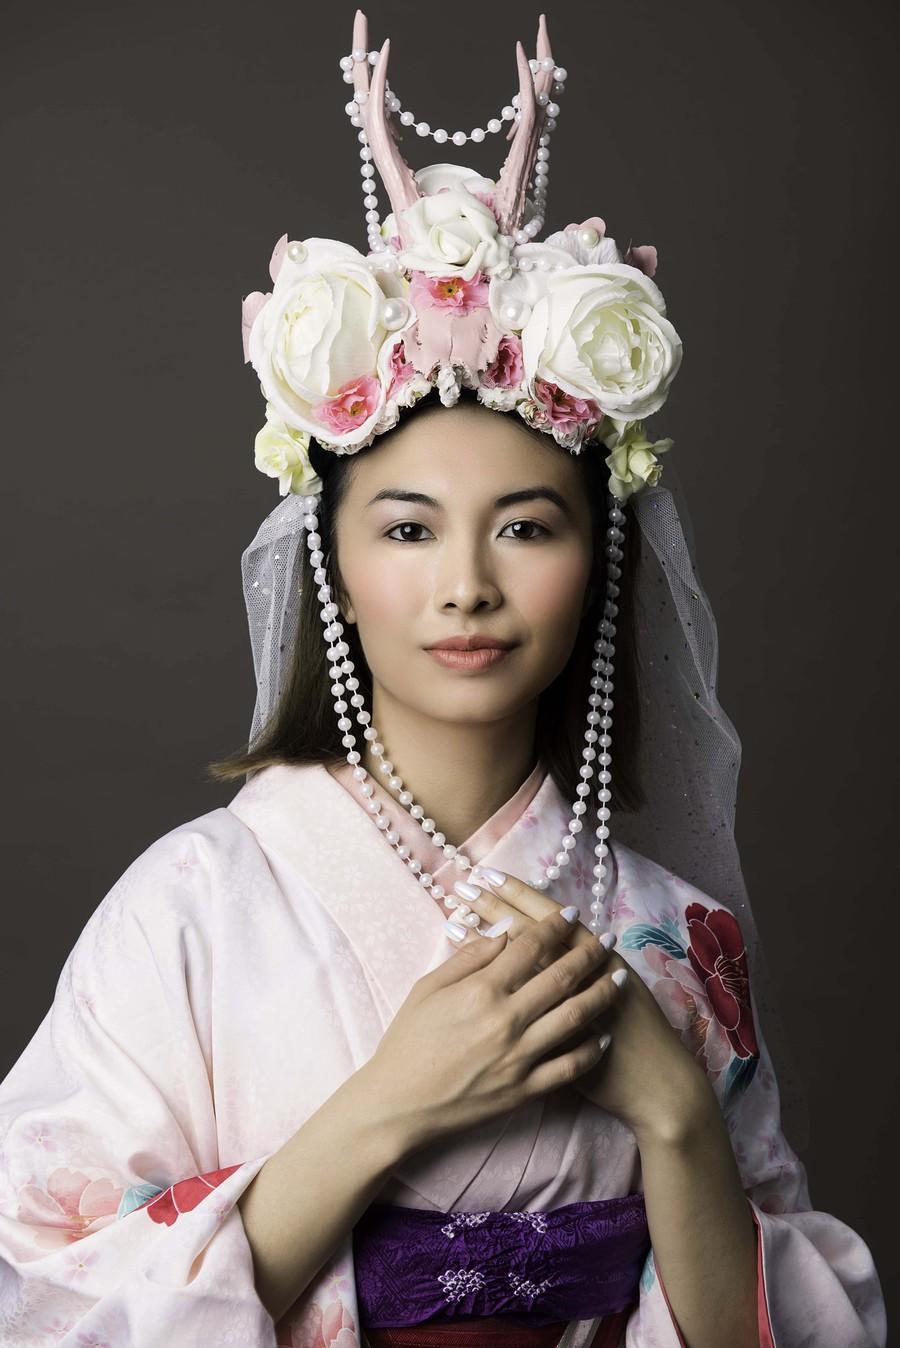 I will protect the forest / Stylist Kimono Stylist, Designer Kimono Stylist / Uploaded 2nd August 2017 @ 07:22 PM